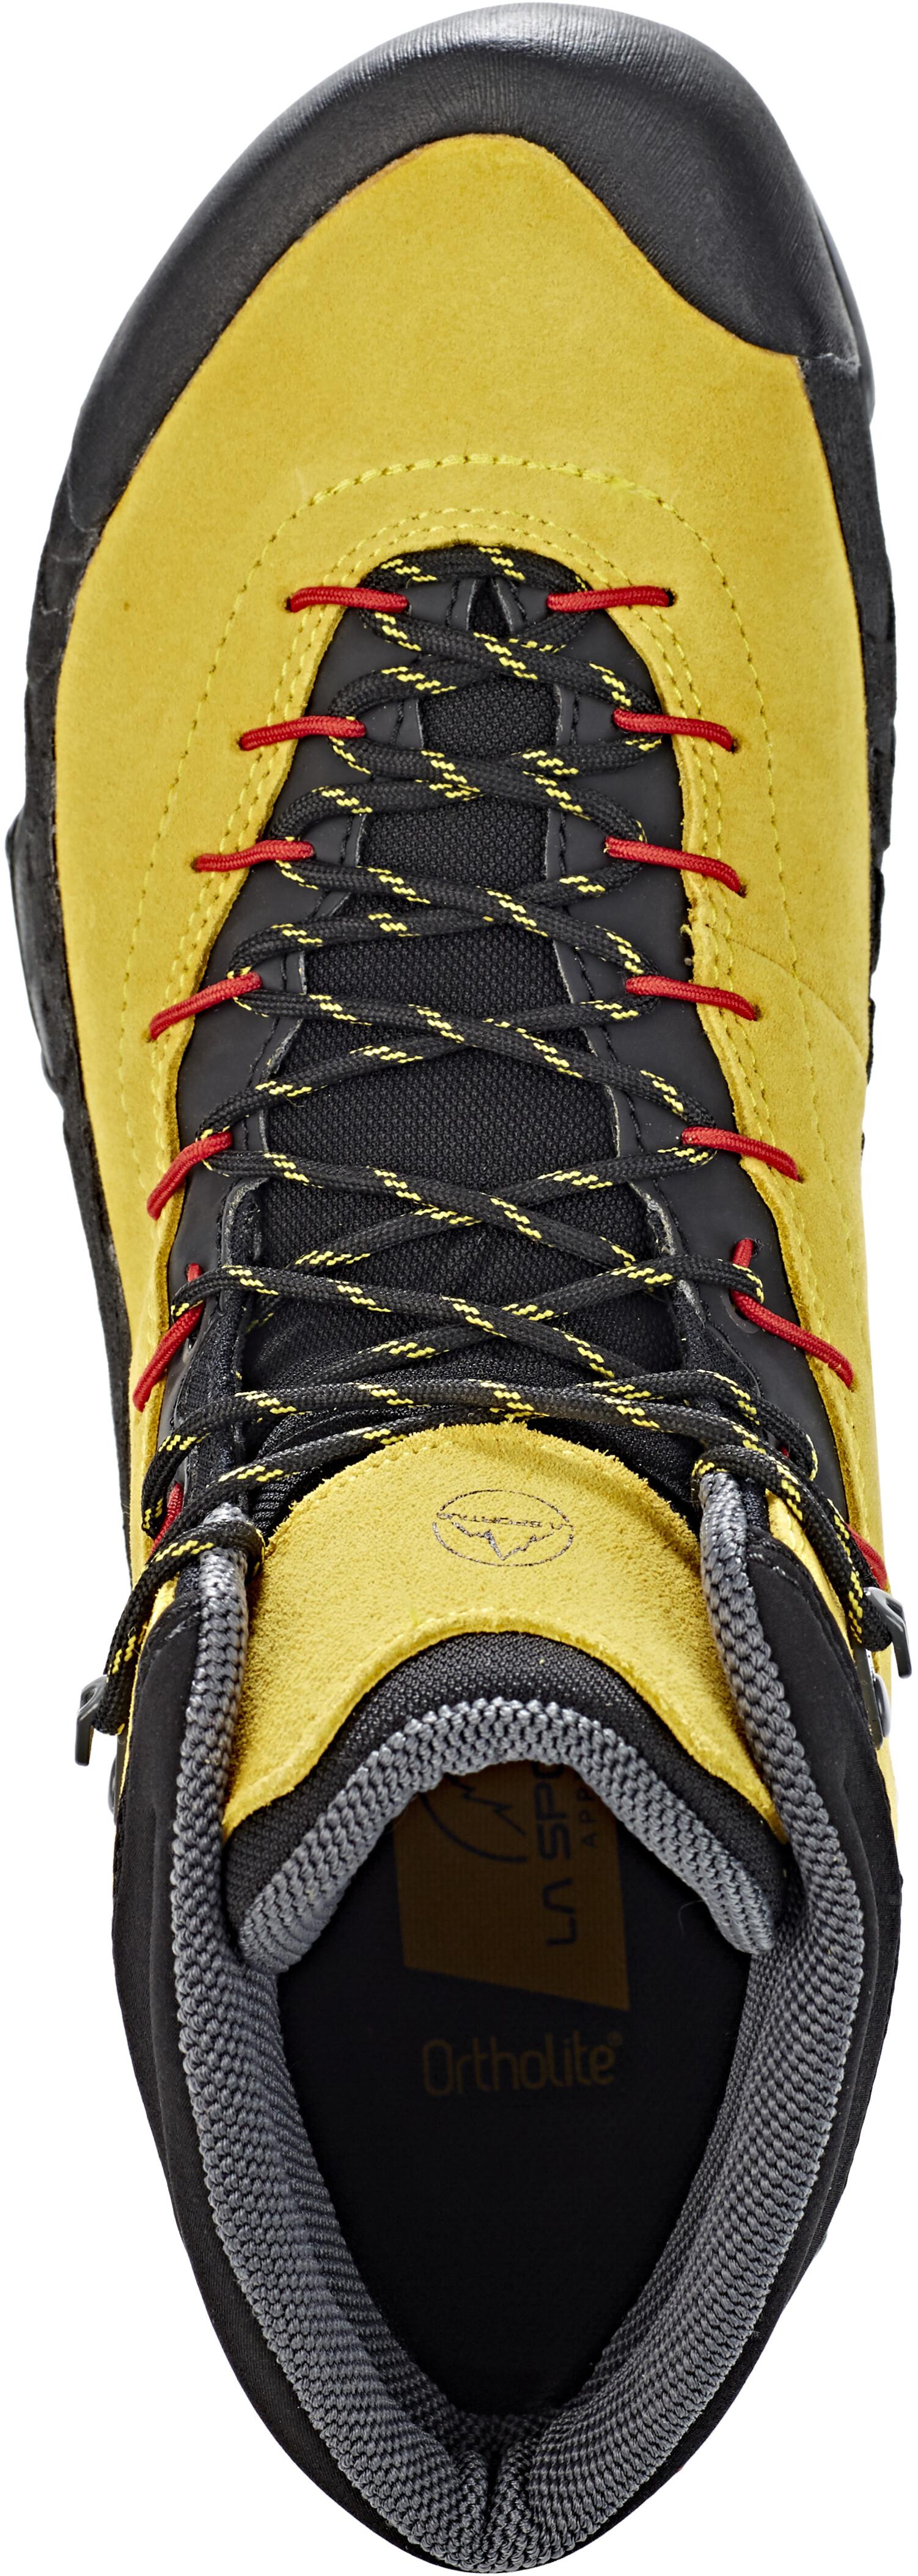 70baa3ecae4e0 La Sportiva TX4 GTX Mid - Chaussures Homme - jaune noir sur CAMPZ !